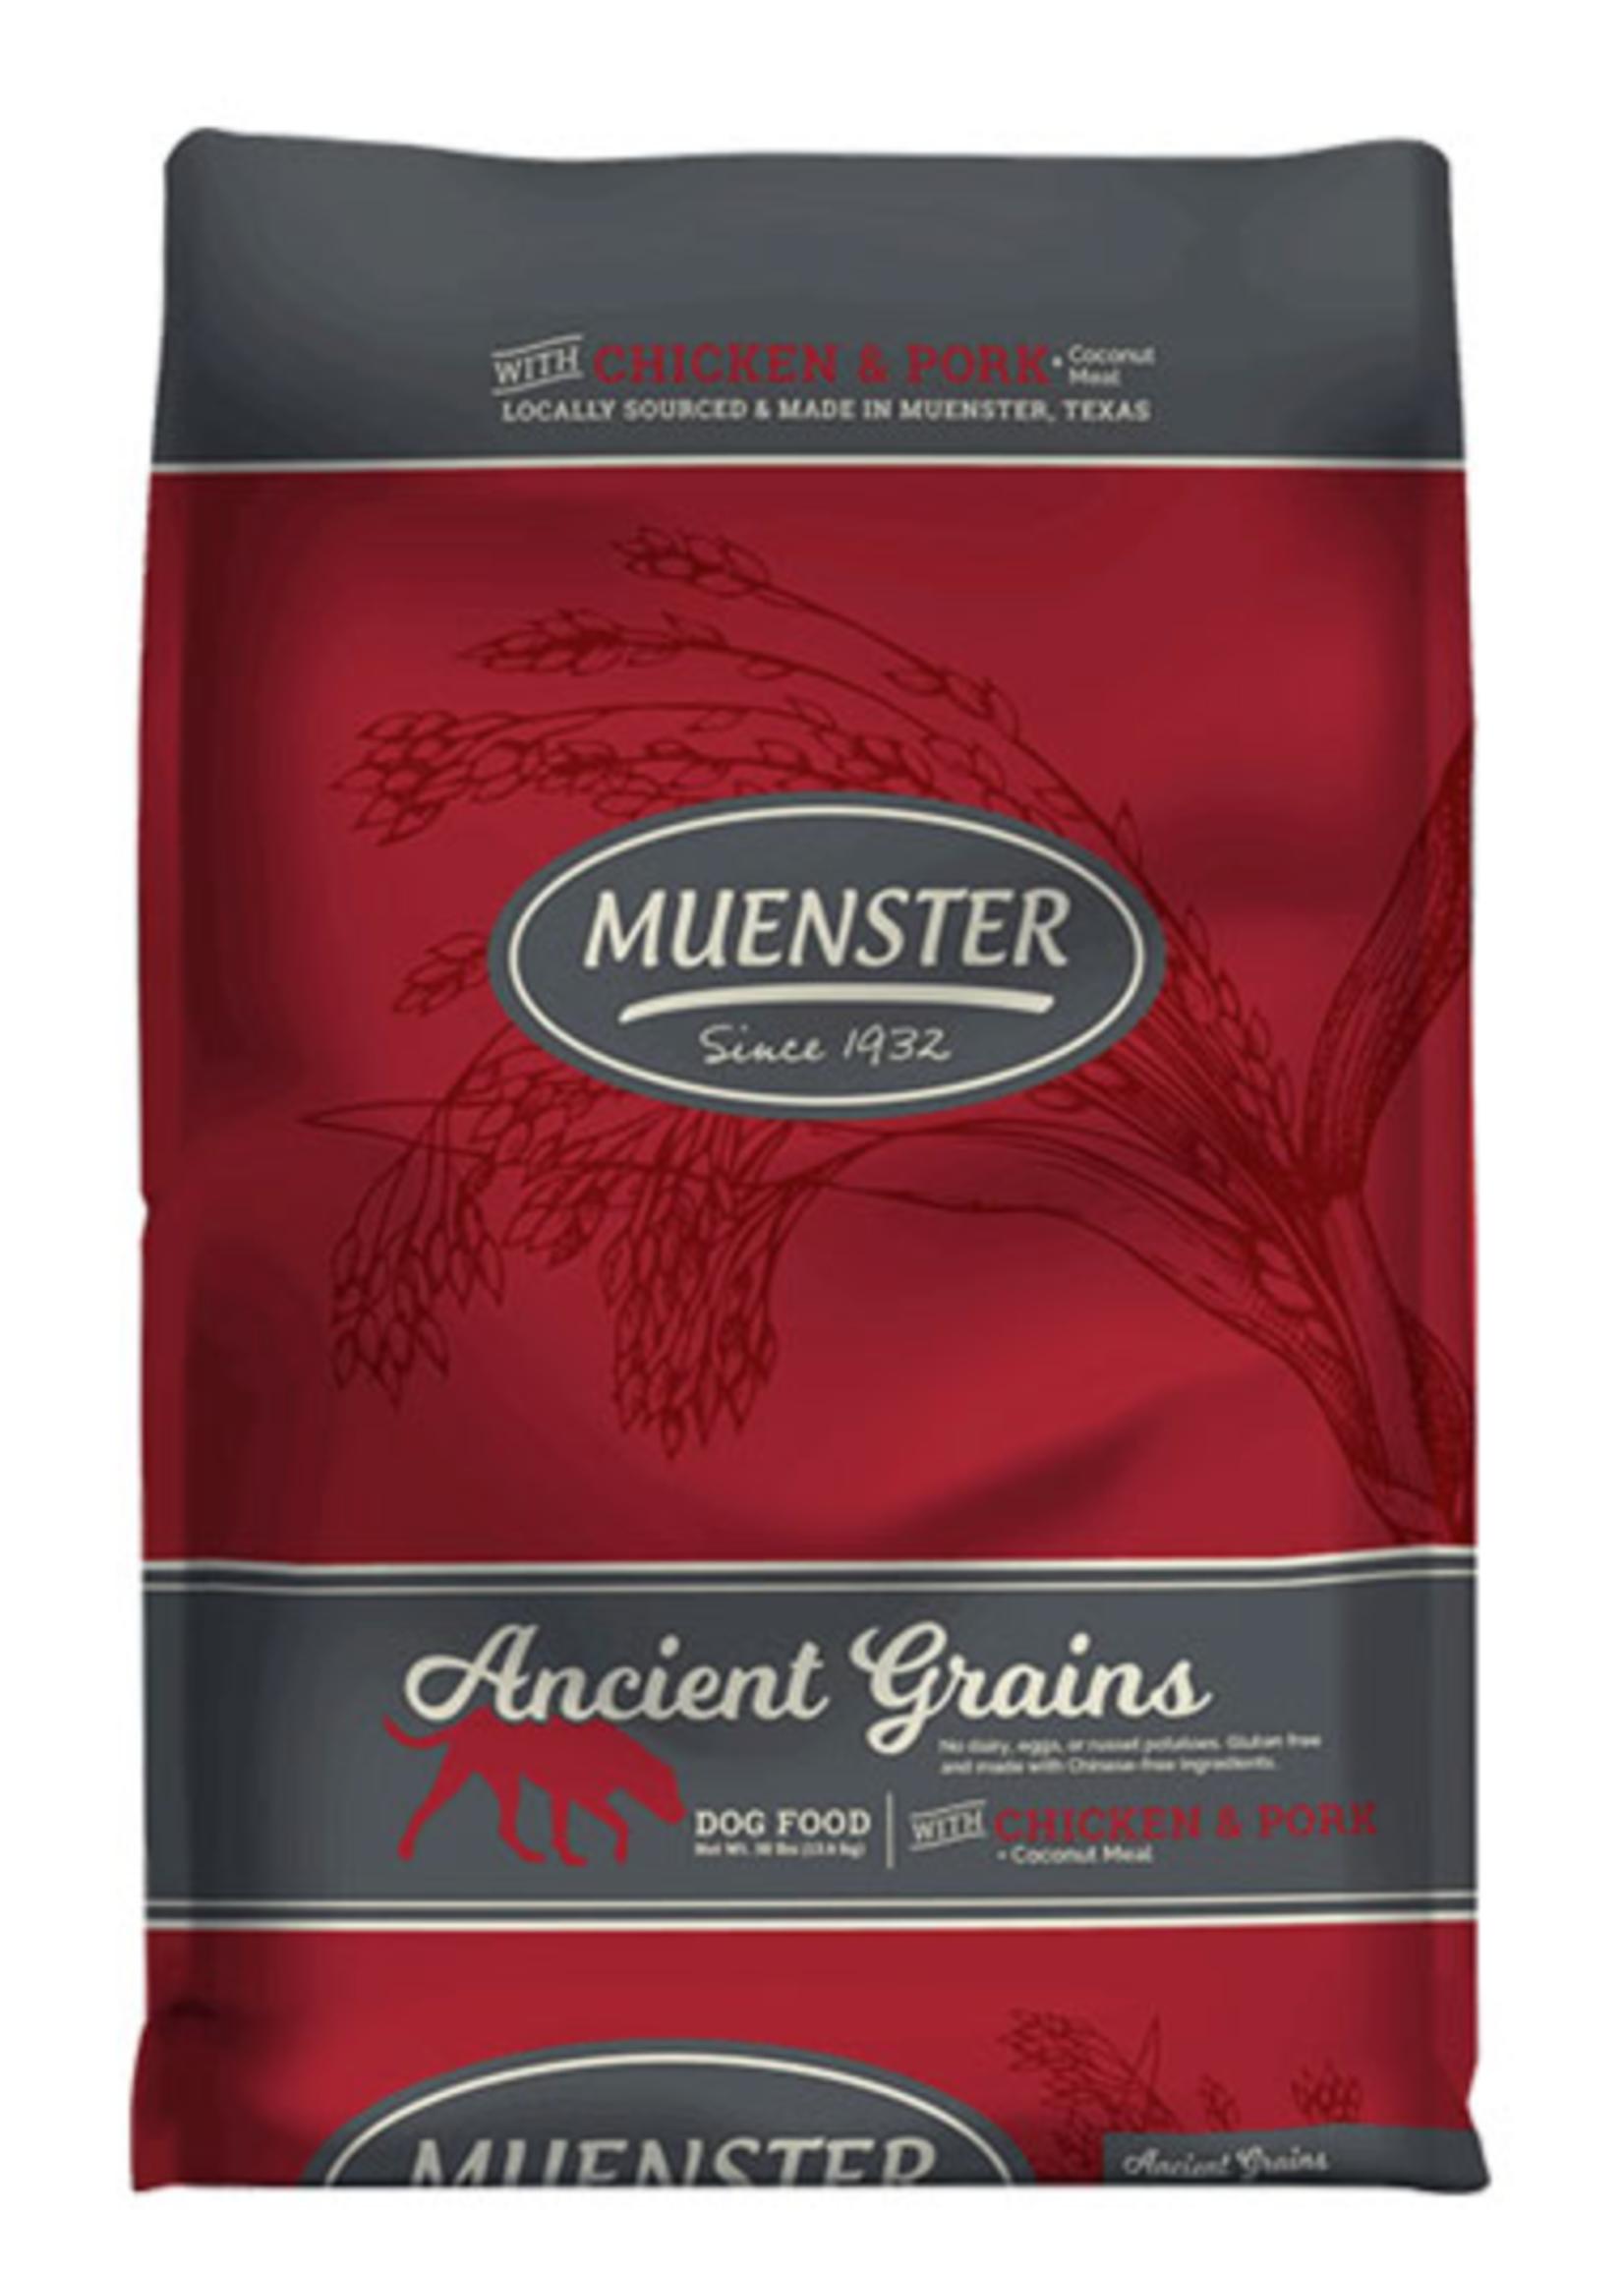 Muenster Milling Co Muenster Ancient Grains Chicken & Pork 30lbs